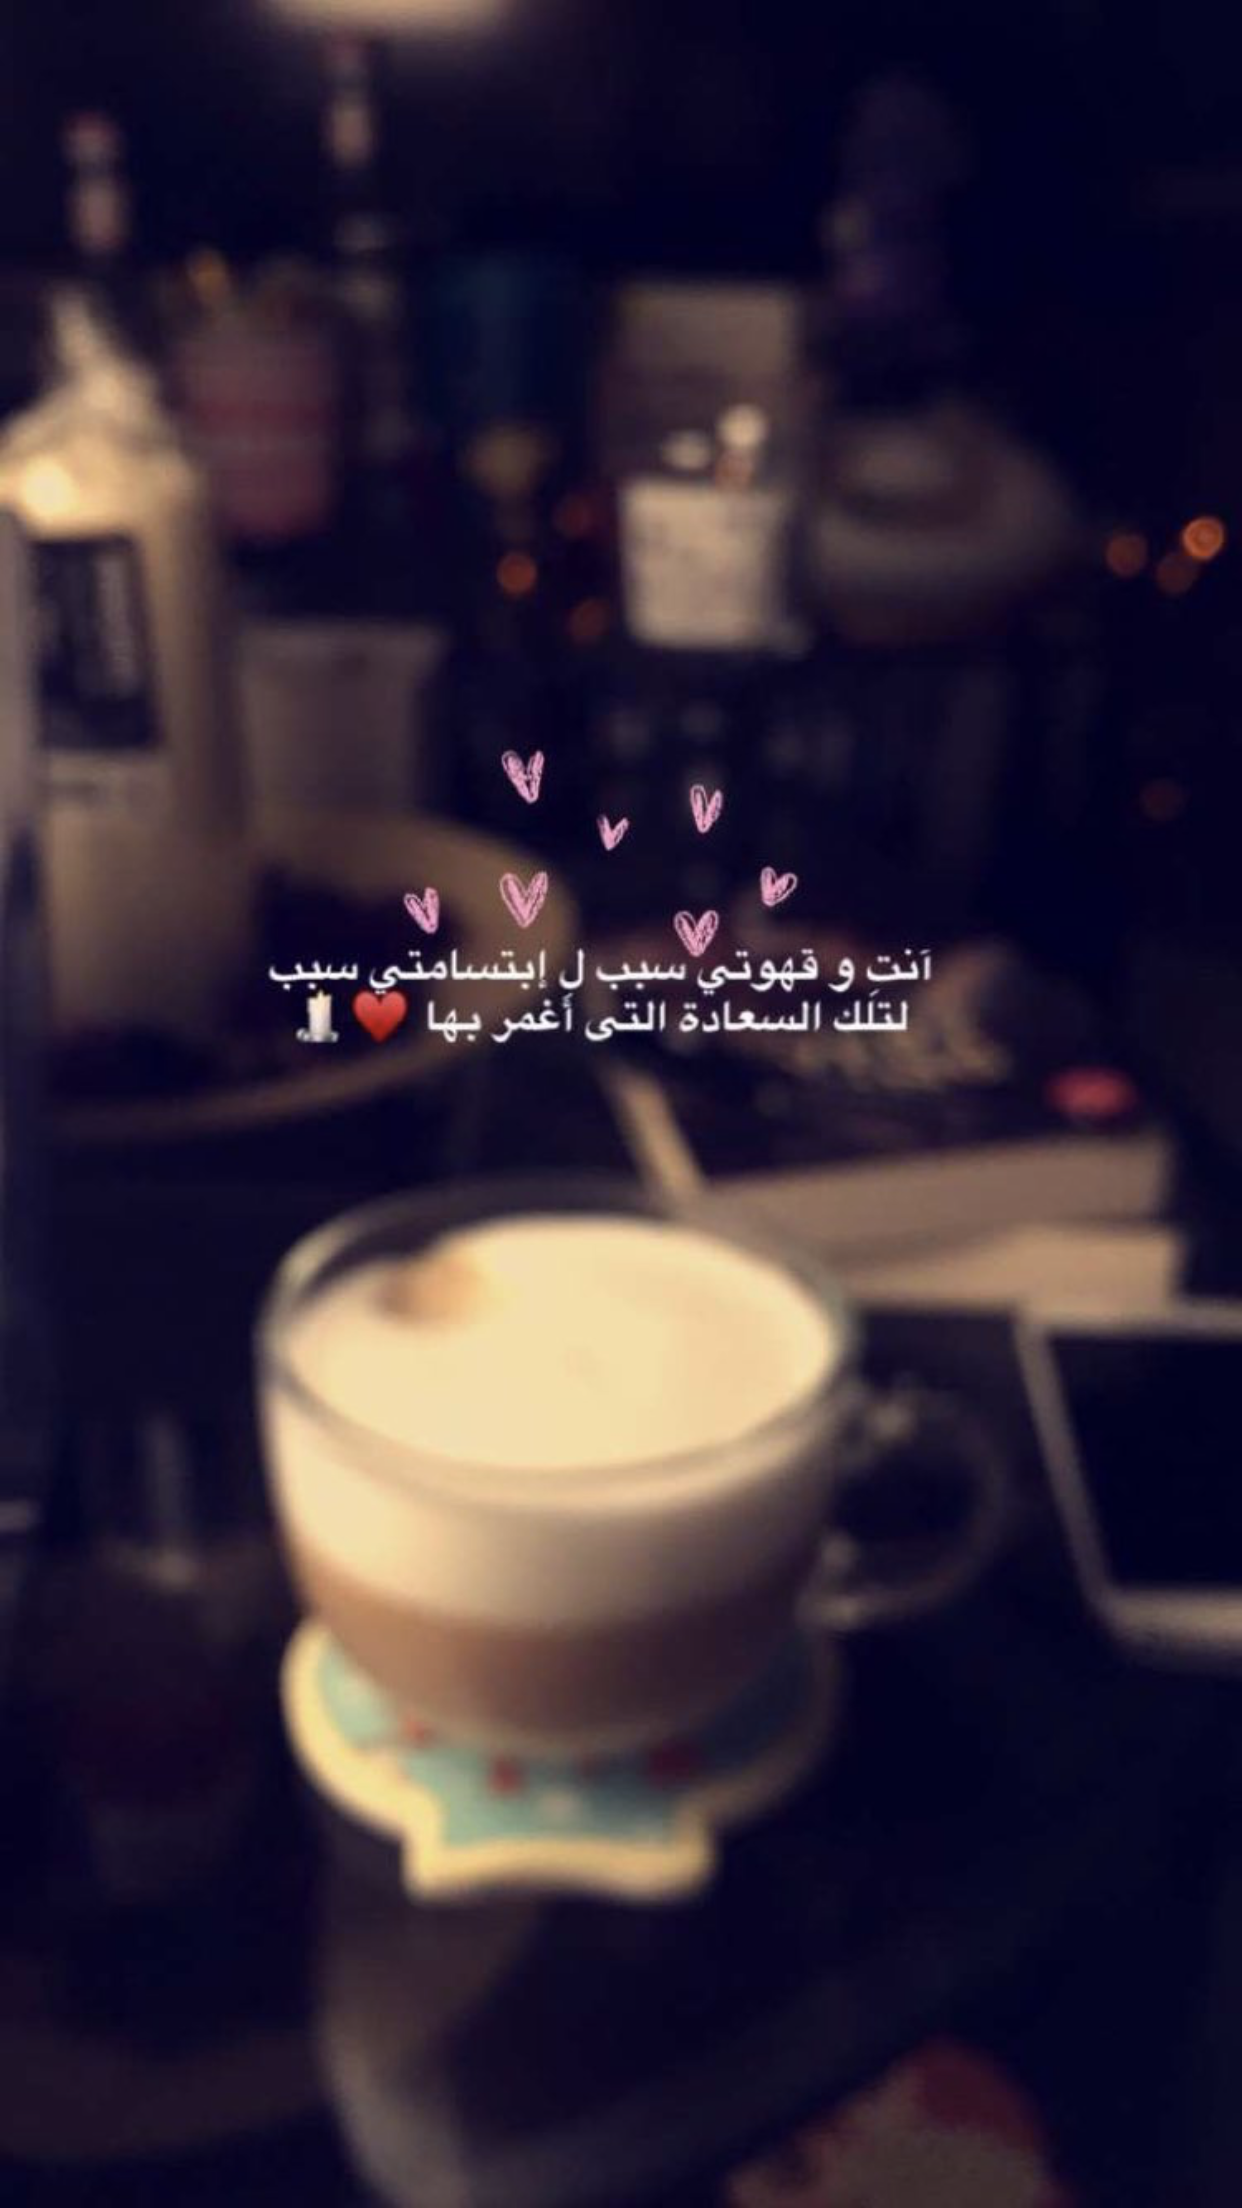 أنته وقهوتي سبب ل ابتسامتي Beautiful Quran Quotes Iphone Wallpaper Quotes Love Arabic Quotes